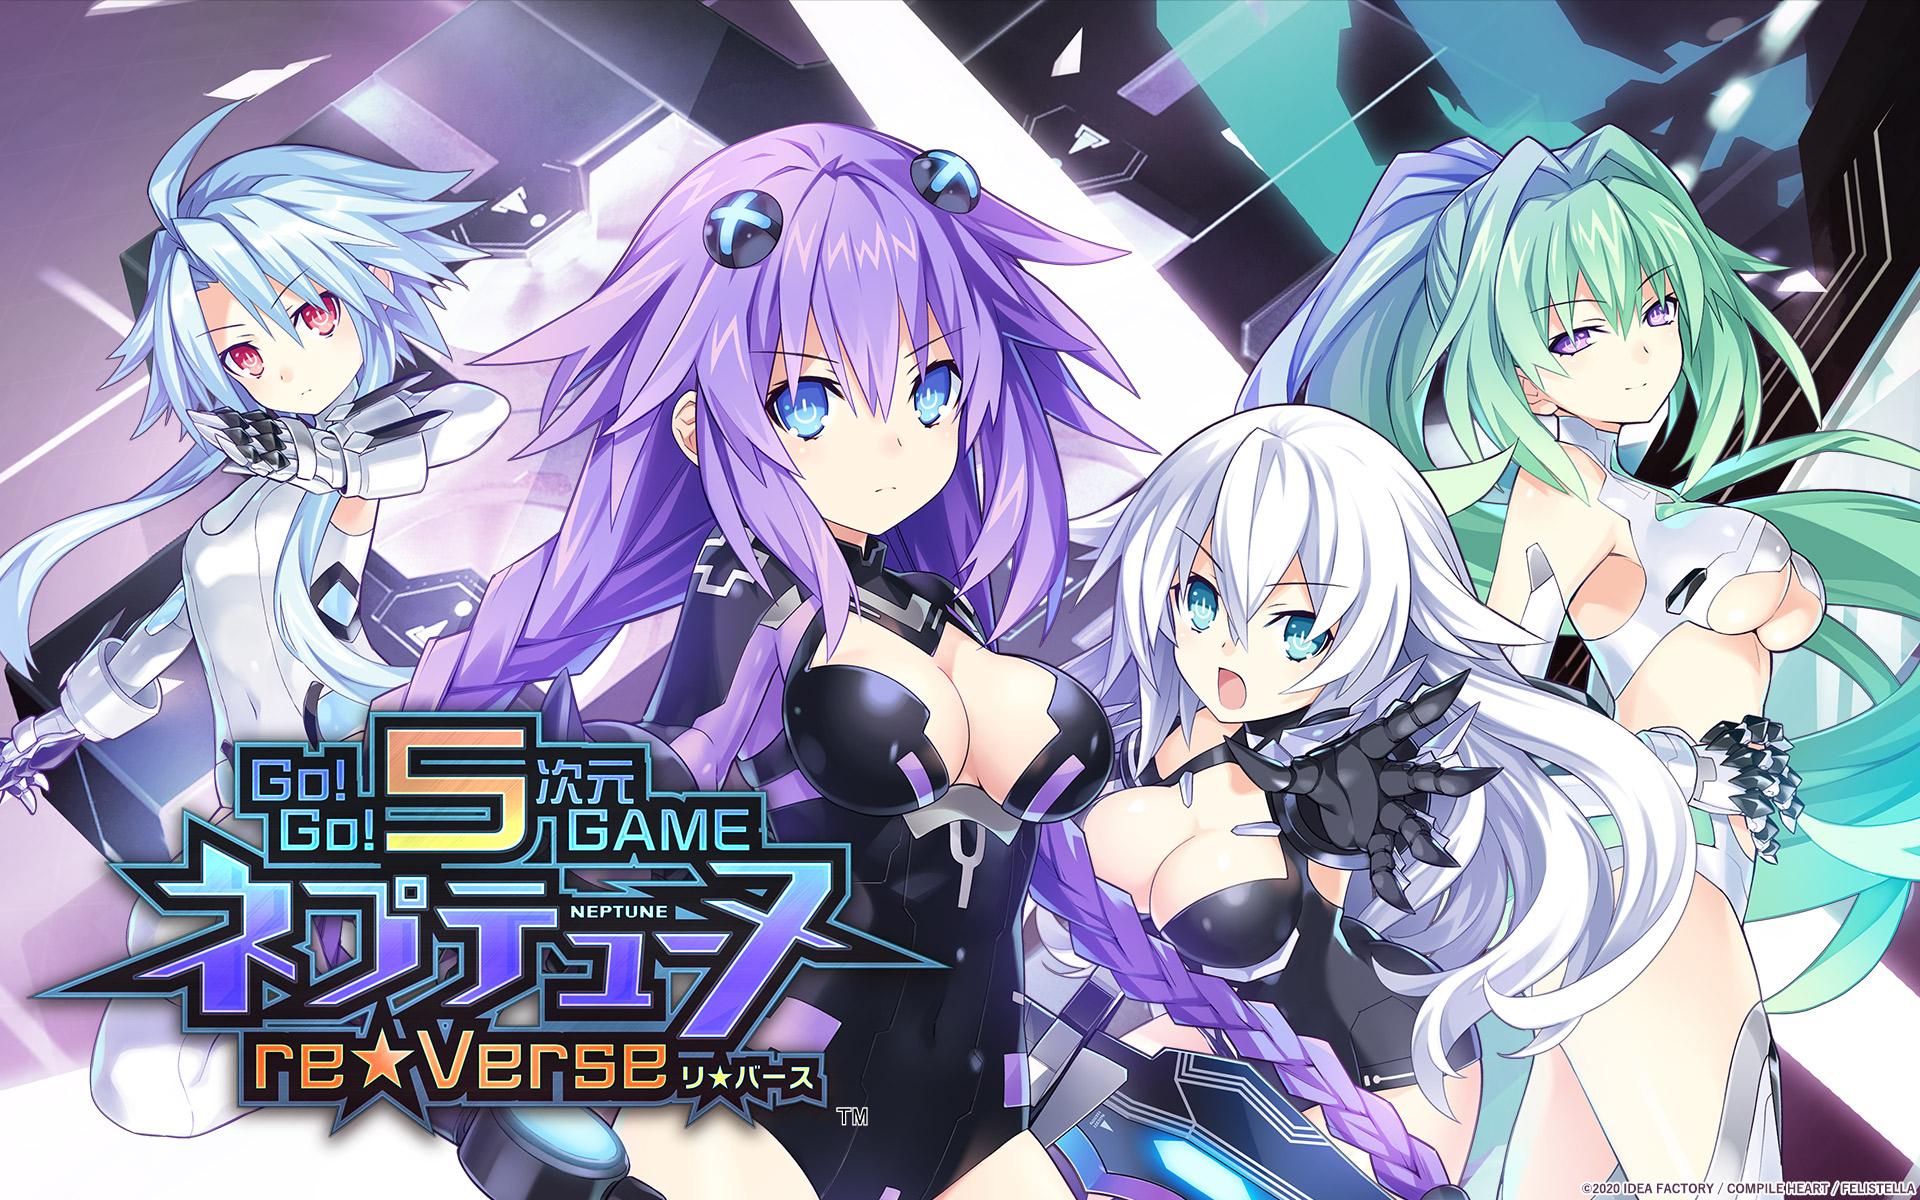 《Go!Go!5次元游戏 海王星 re★Verse》新情报:可改变武器性能